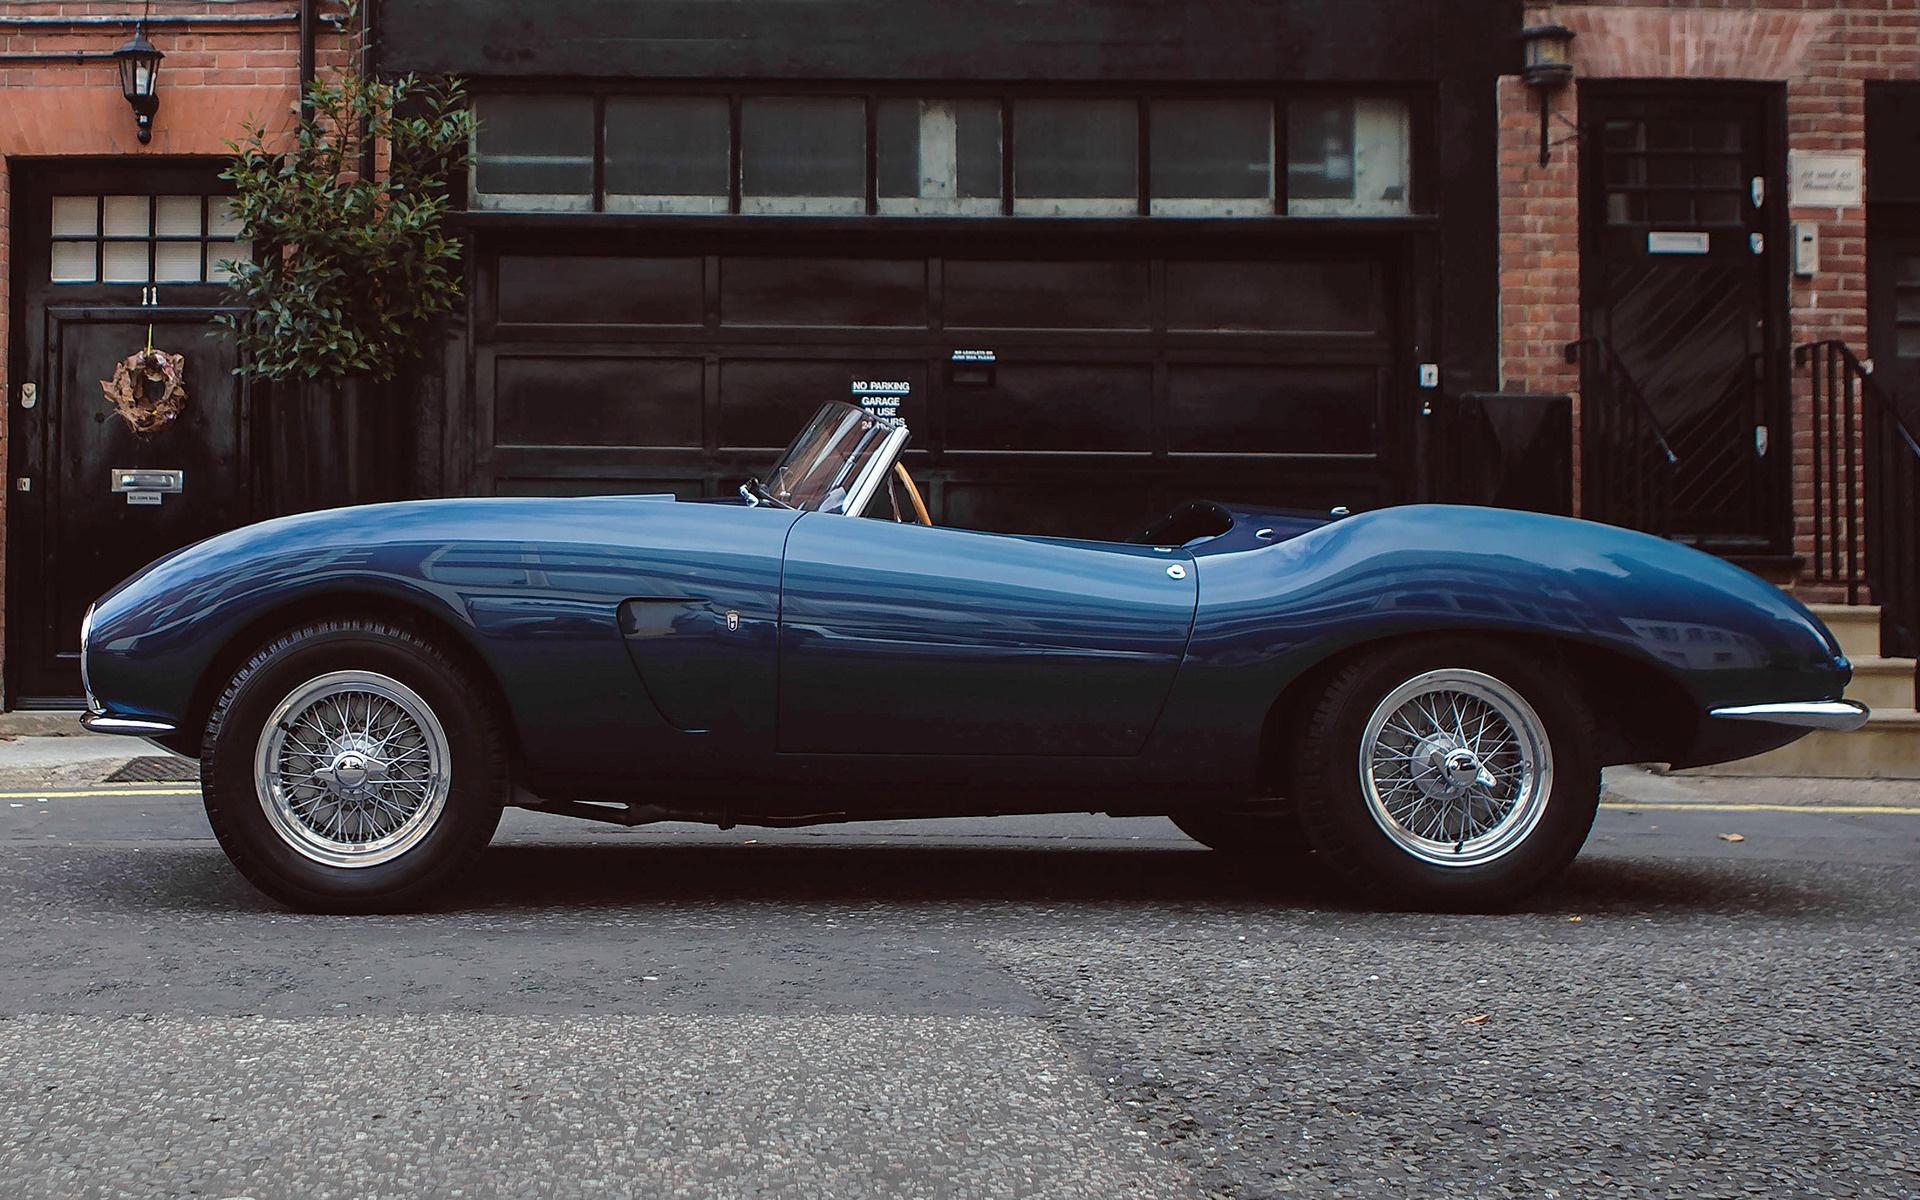 1954 Aston Martin Db2 4 Bertone Spider Lml 505 Wallpapers And Hd Images Car Pixel